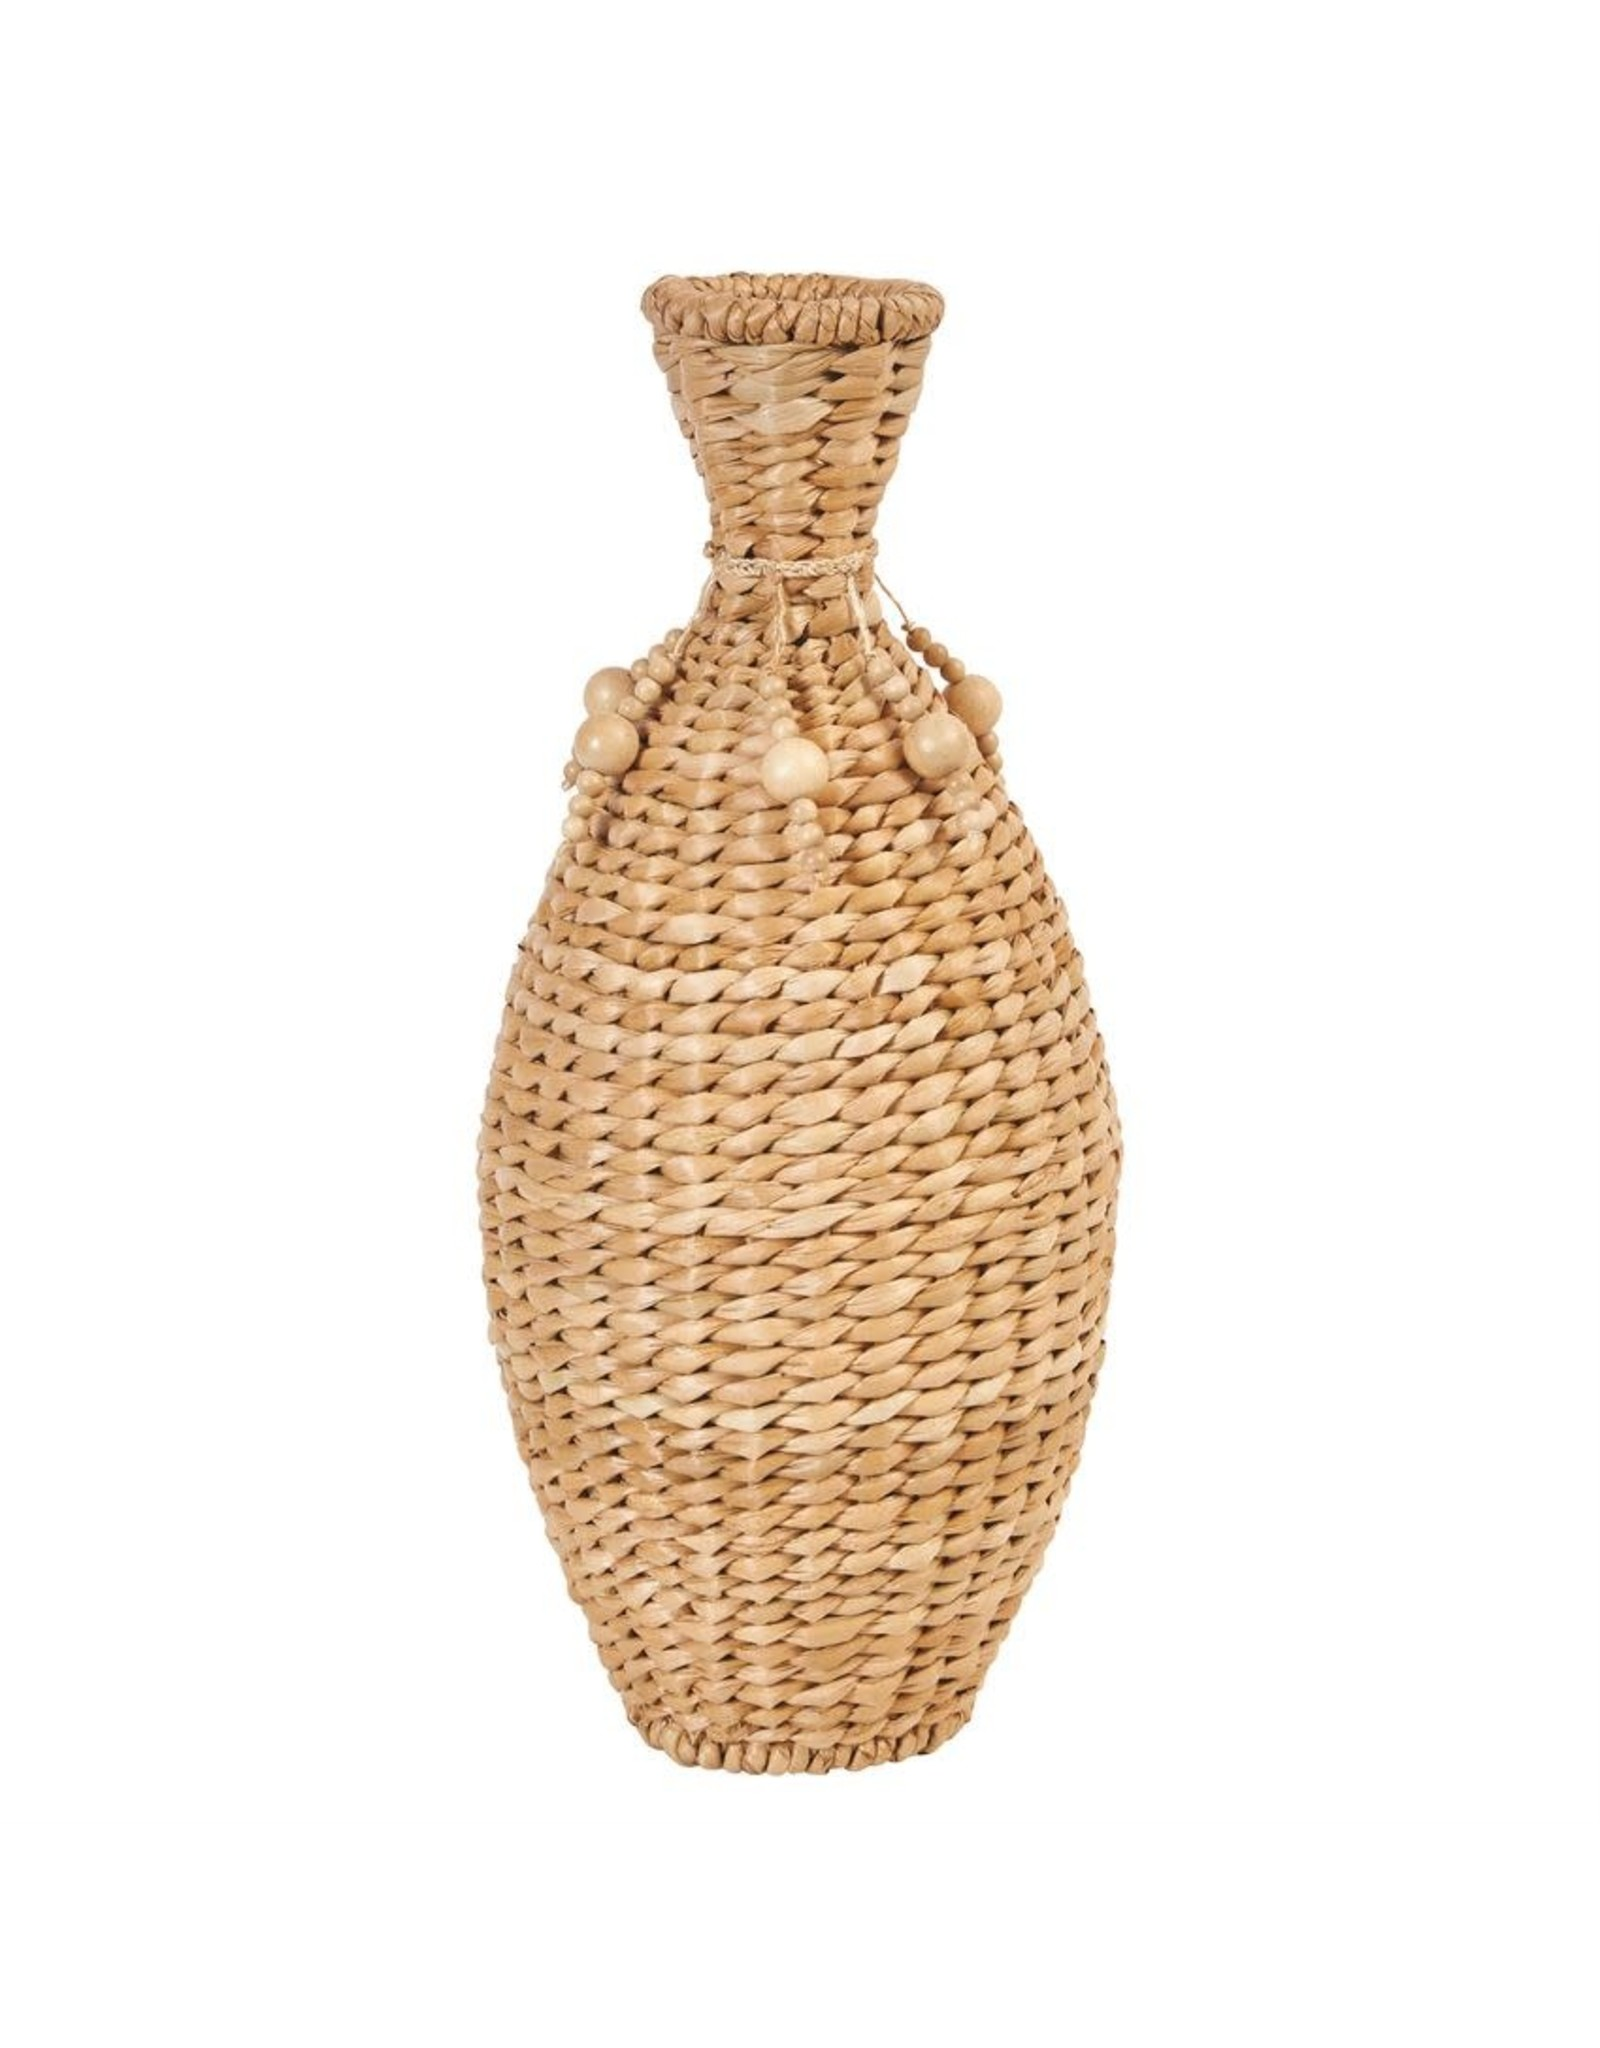 Bloomingville Hand-Woven Water Hyacinth Vase w/ Wood Beads